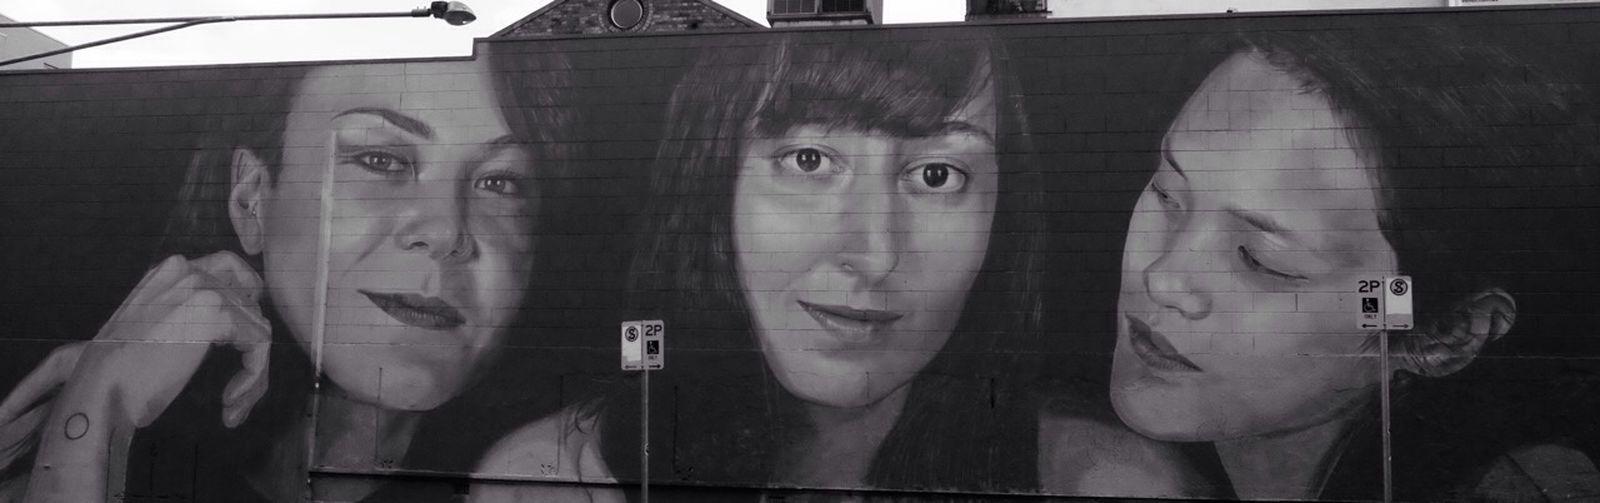 Girls in the street Streetart Streetphotography Enjoying Life Urban Lifestyle